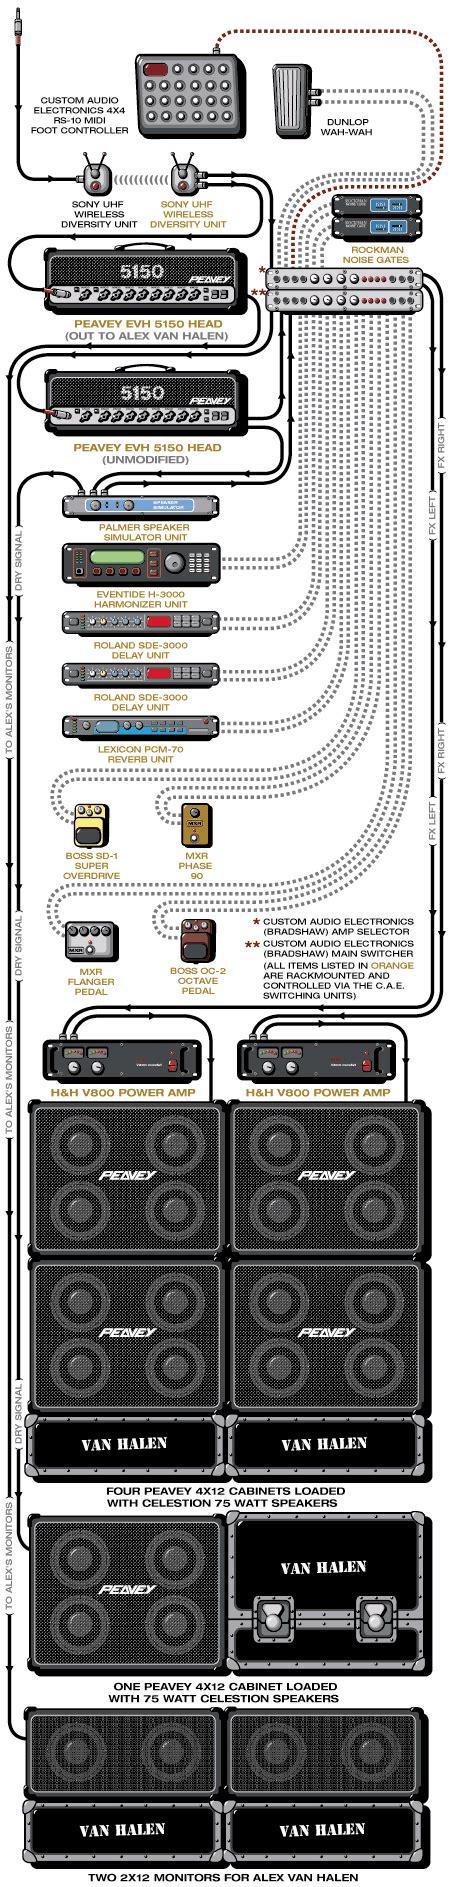 Power Lifier Wisdom Pa 1800 peavey speakers diagram dbx speaker diagram elsavadorla